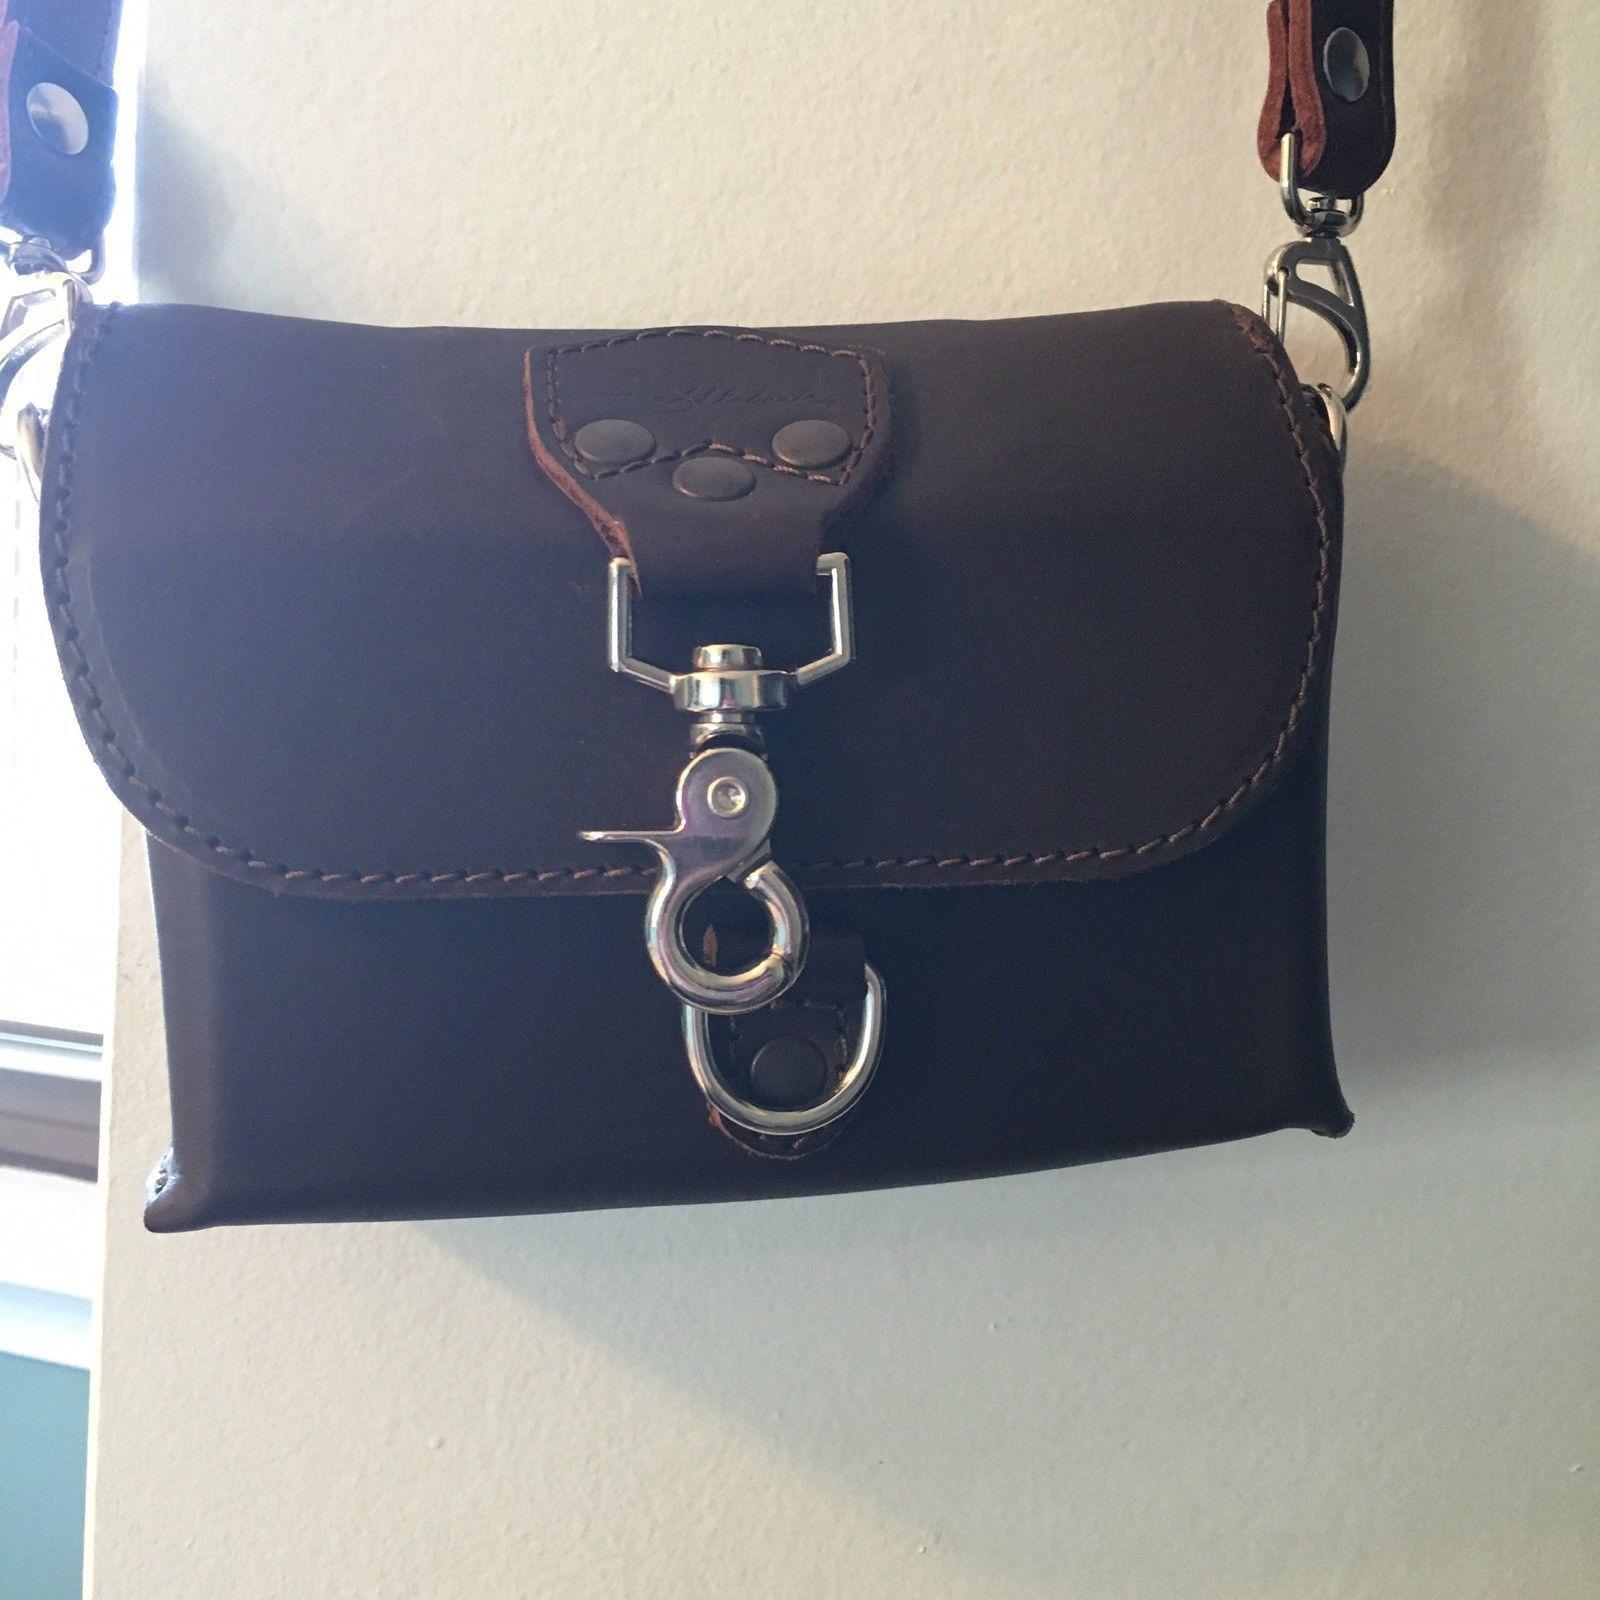 817af476fa Saddleback Leather Clutch Purse - 100 Year and 50 similar items. S l1600